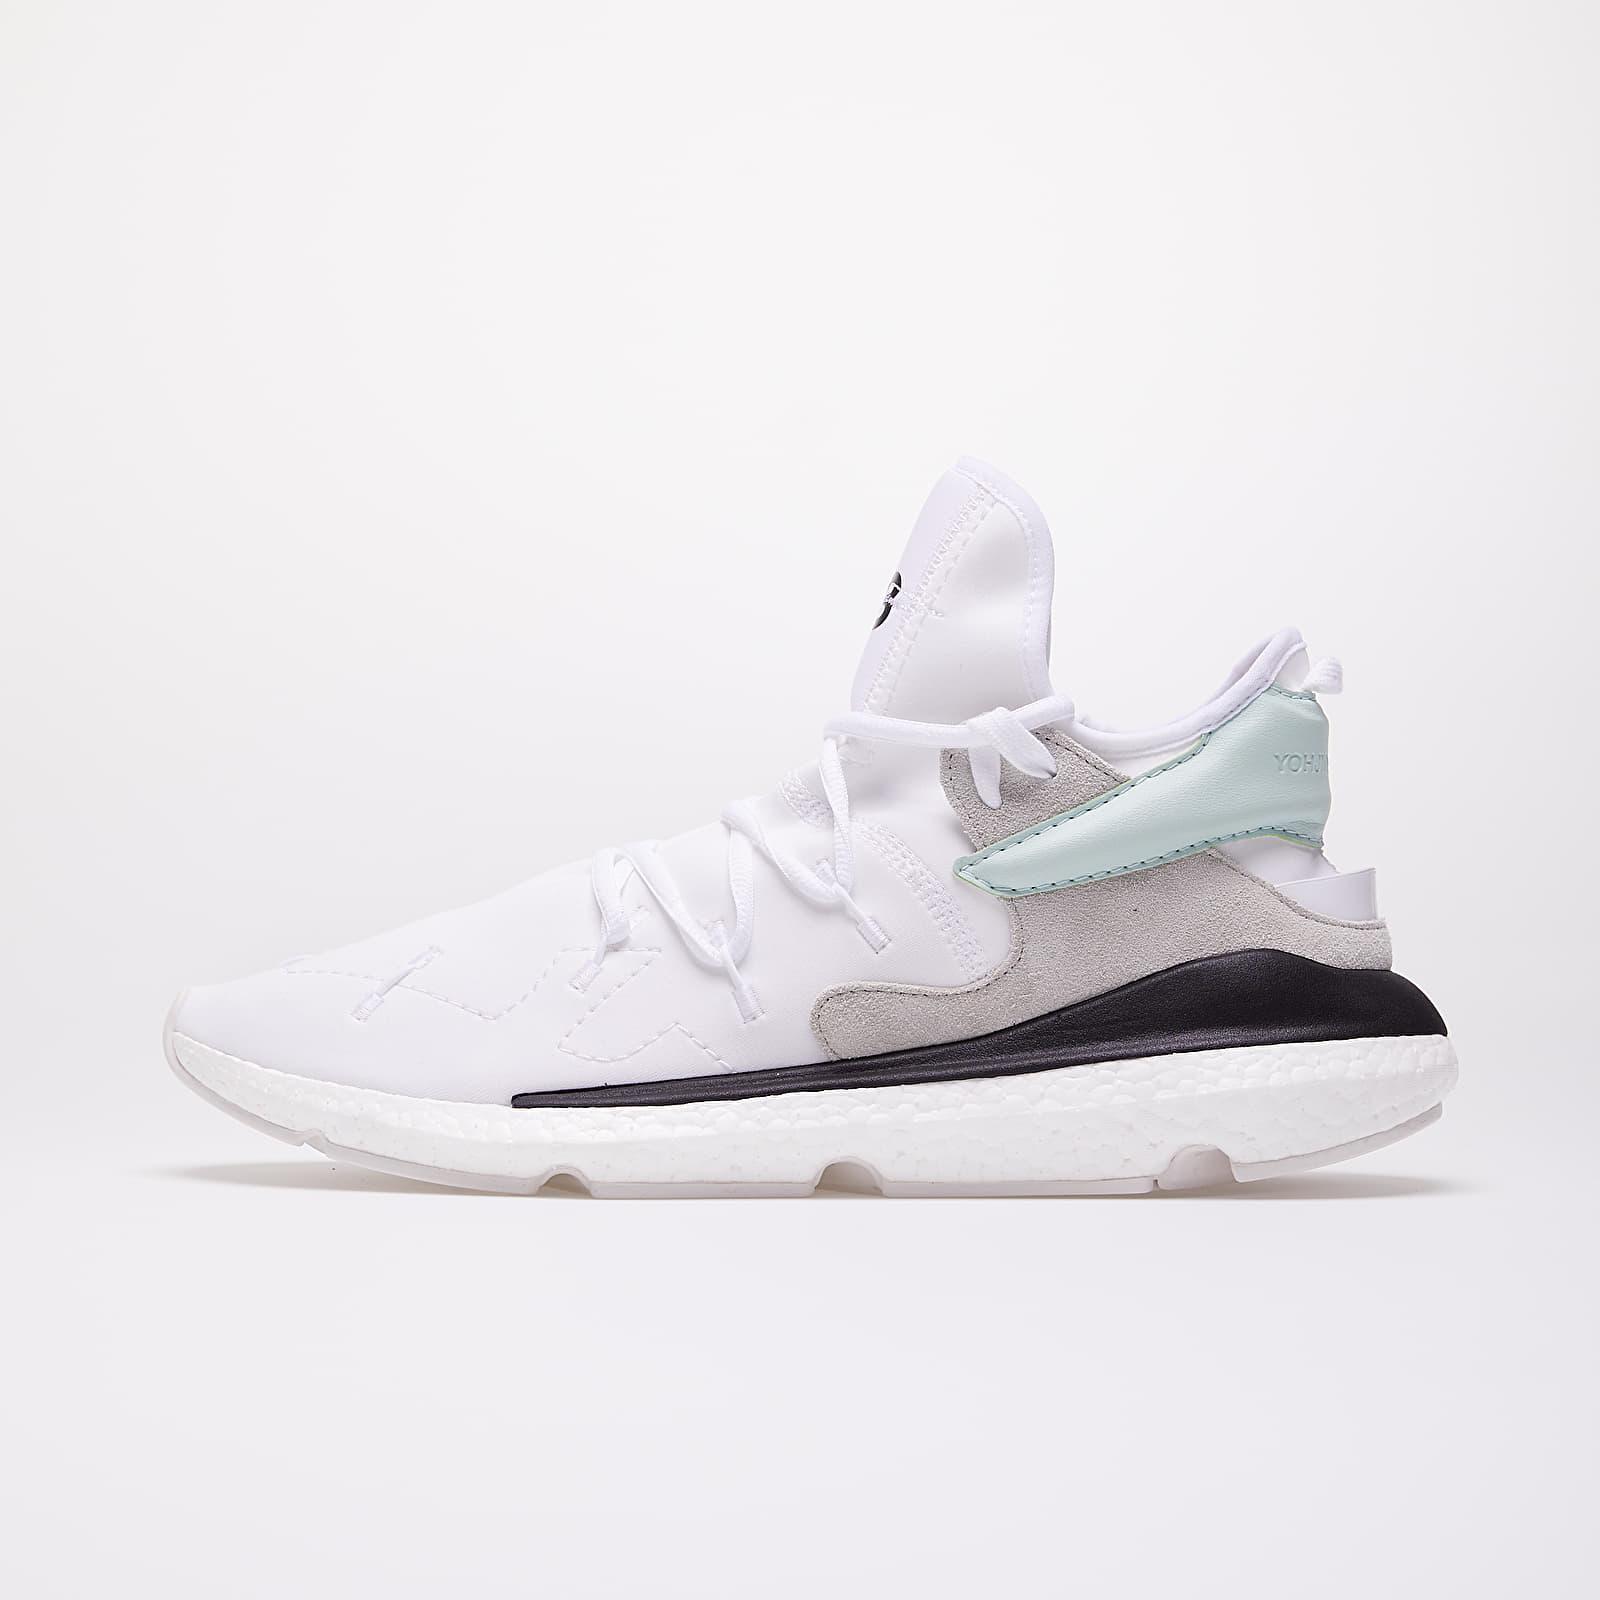 Men's shoes Y-3 Kusari II Ftw White/ Salty Green/ Core Black